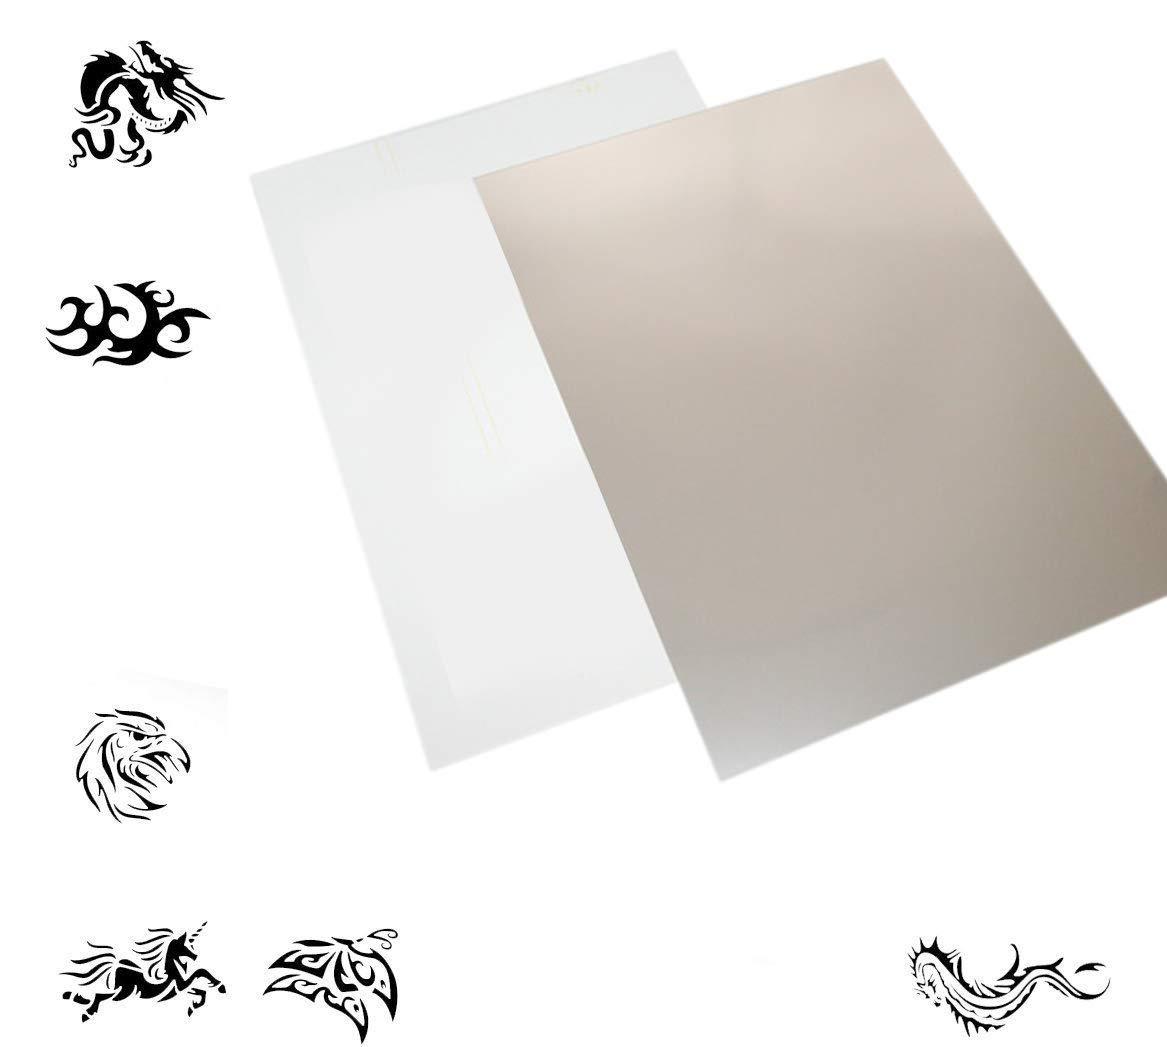 Mylar Stencil Material Pack of 50 A4 Mylar Film + 51 Digital Graphics VEDA